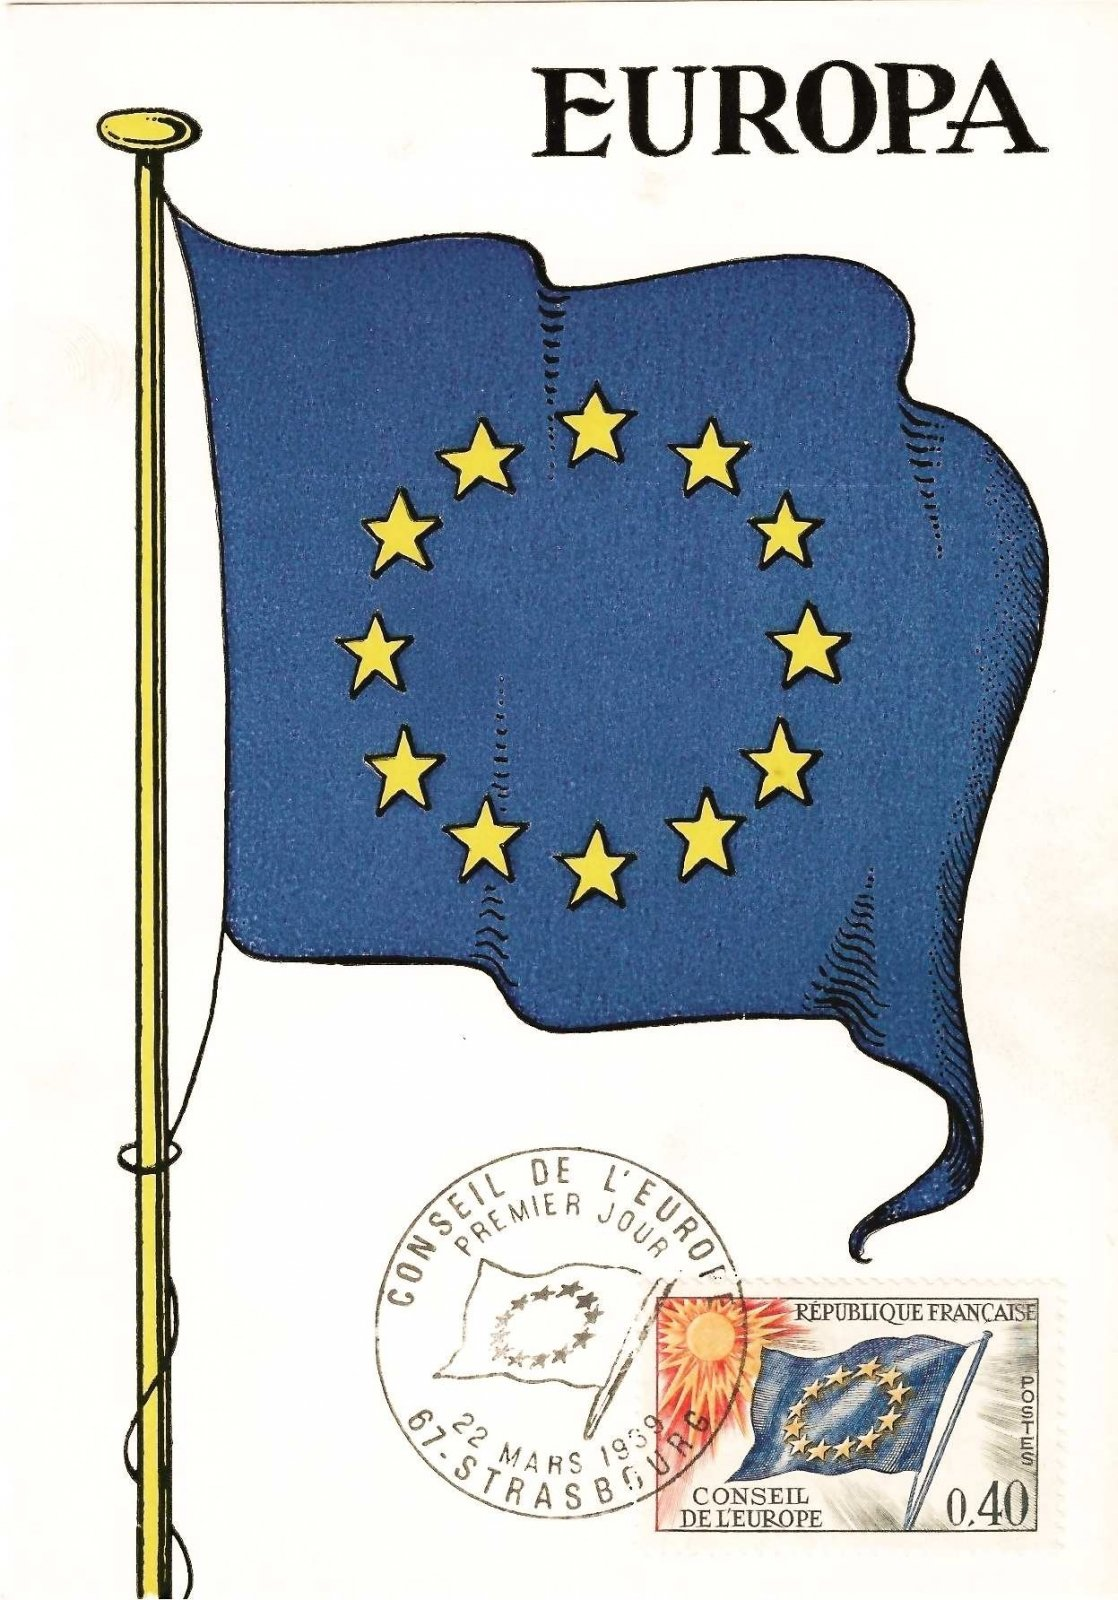 1989 conseil de europe